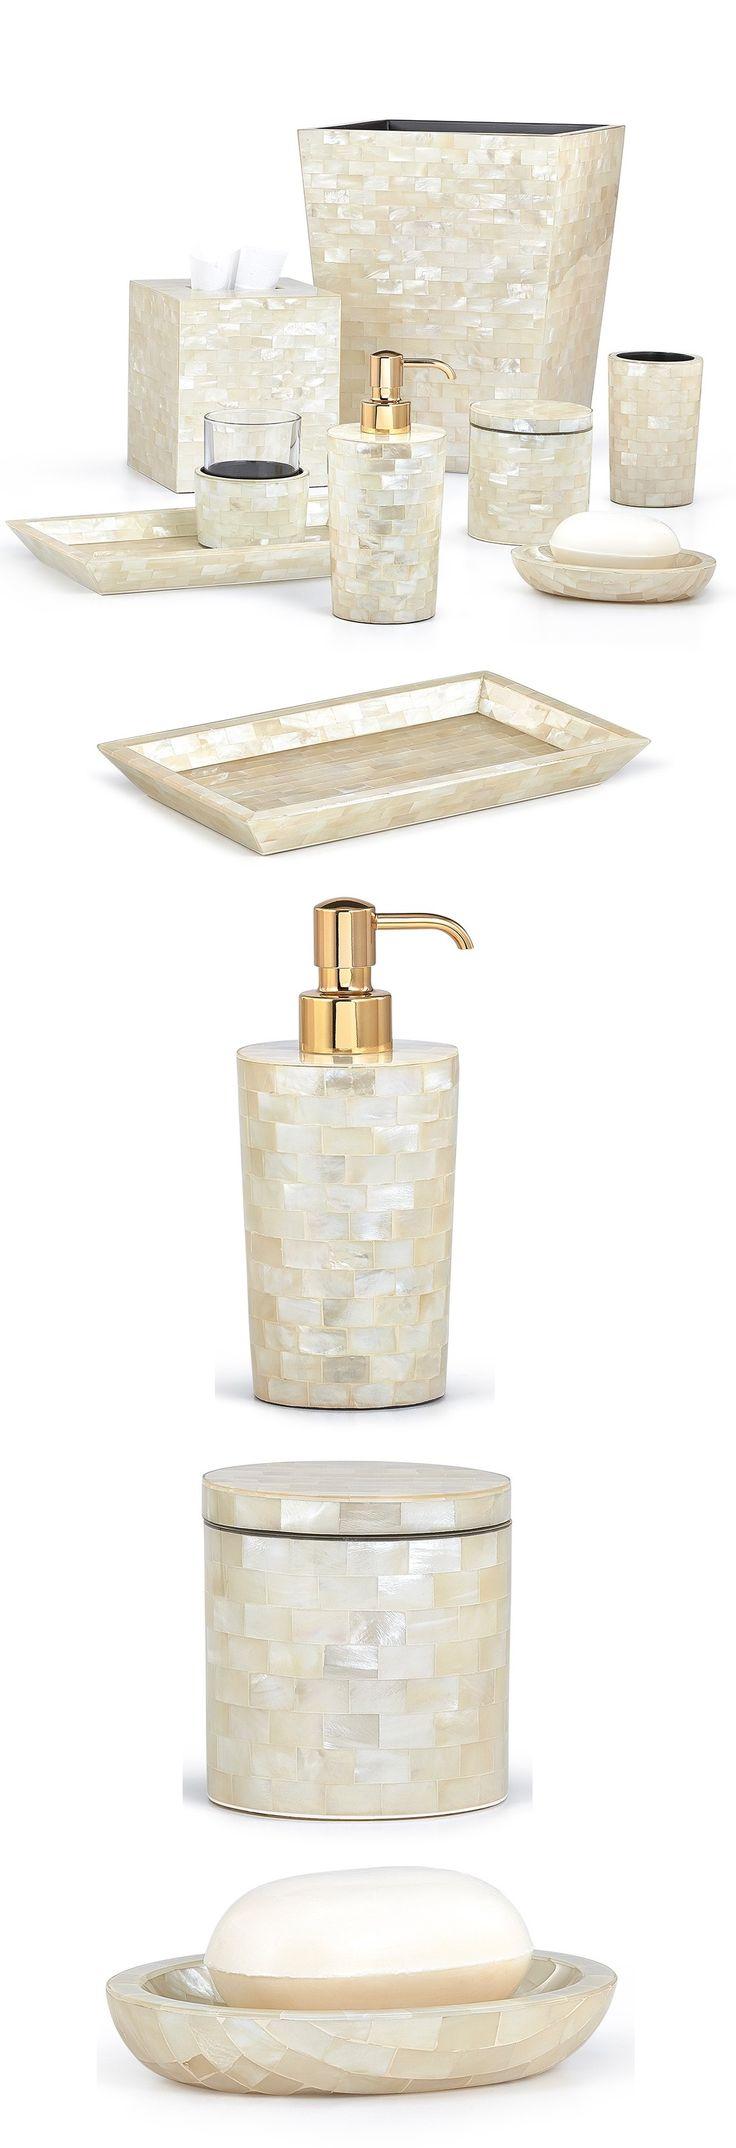 86 best elegancia para el baño images on pinterest | bathroom